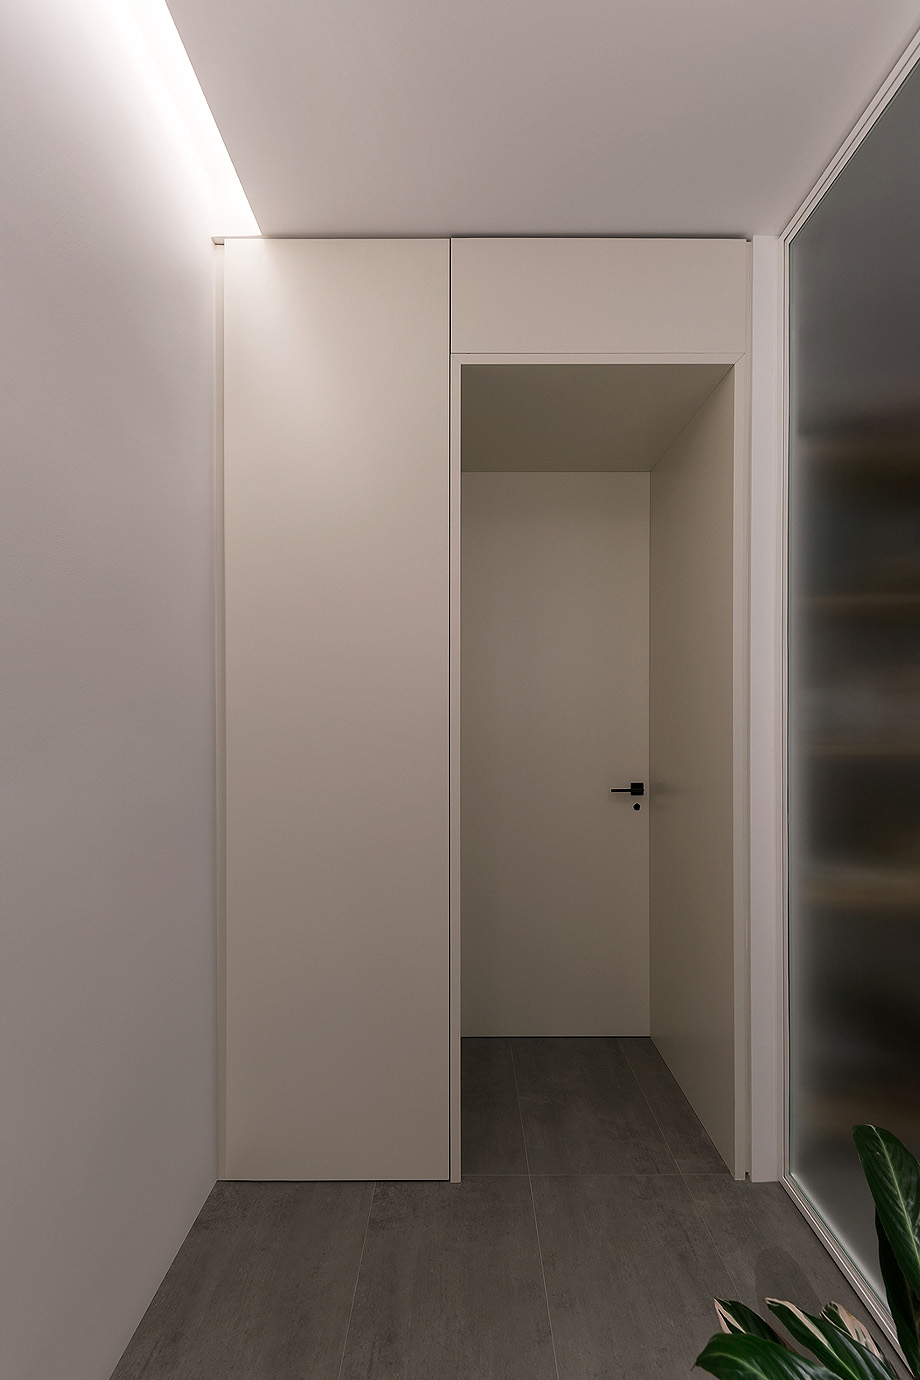 piso echegaray de nan arquitectos - foto ivan casal nieto (12)